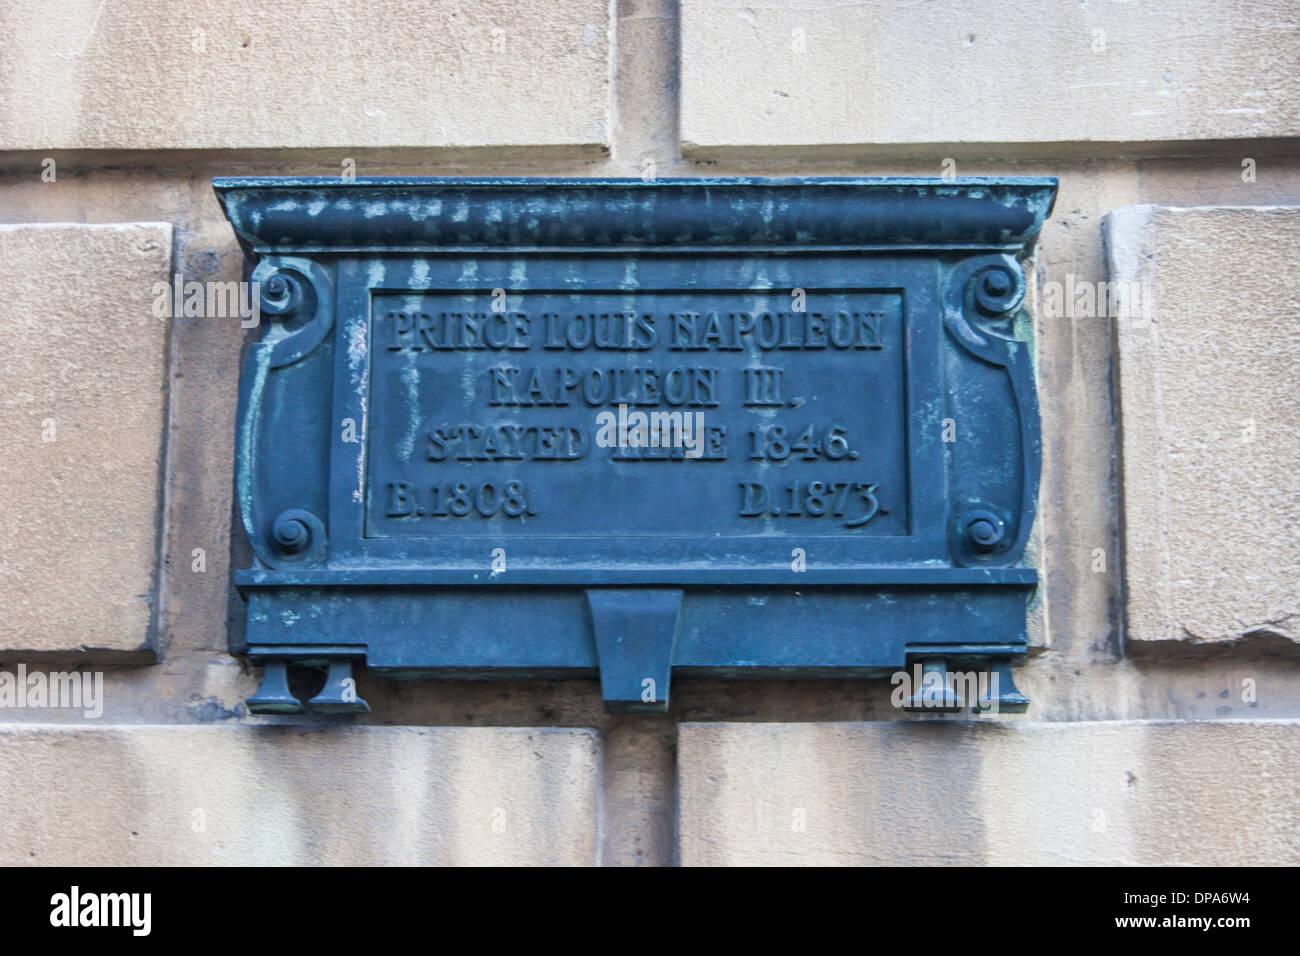 55, Great Pulteney Street, Bath Somerset: brass plaque: Prince Louis ...